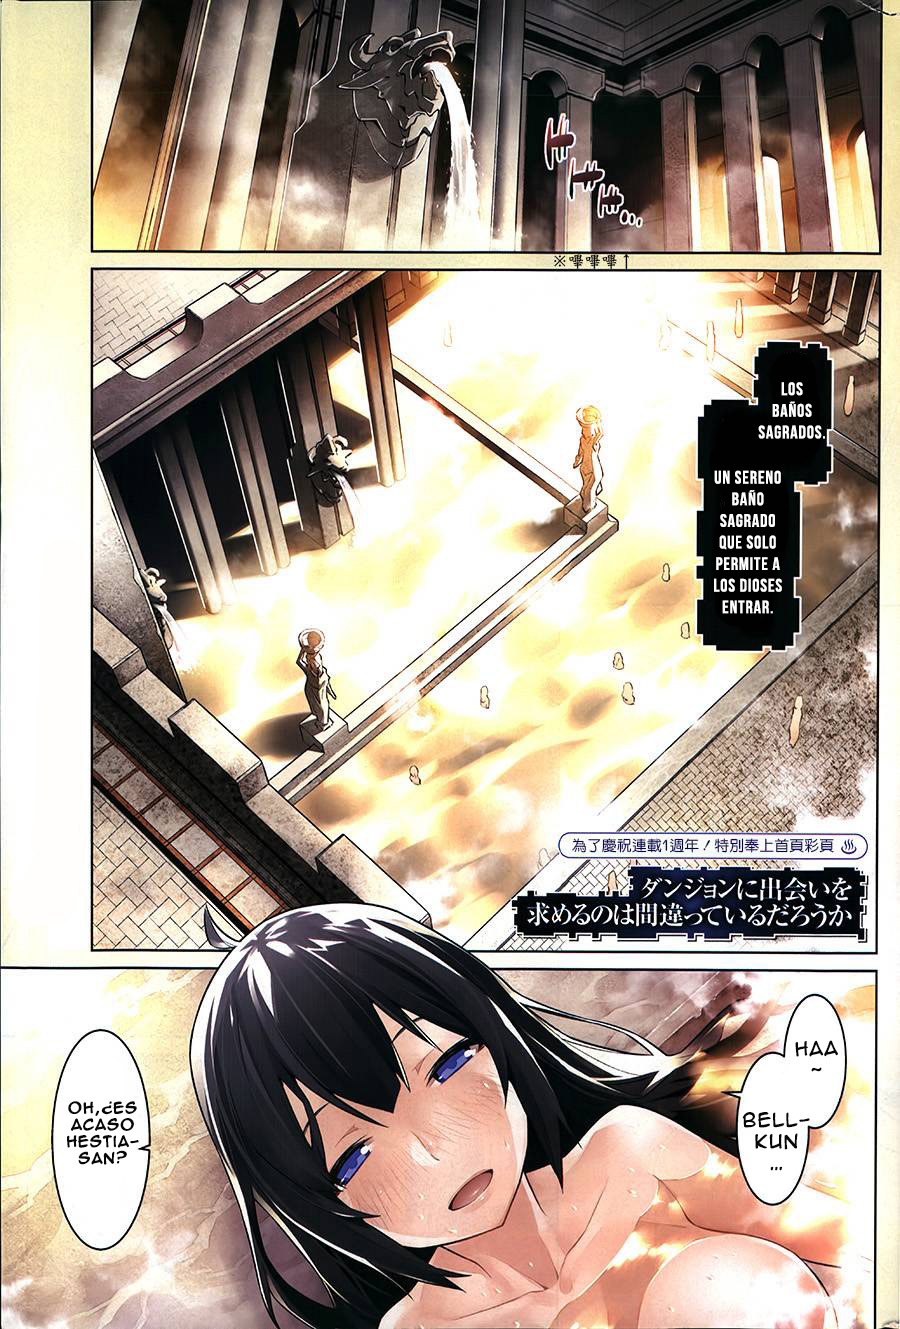 http://c5.ninemanga.com/es_manga/19/14355/356257/eefc7bfe8fd6e2c8c01aa6ca7b1aab1a.jpg Page 3